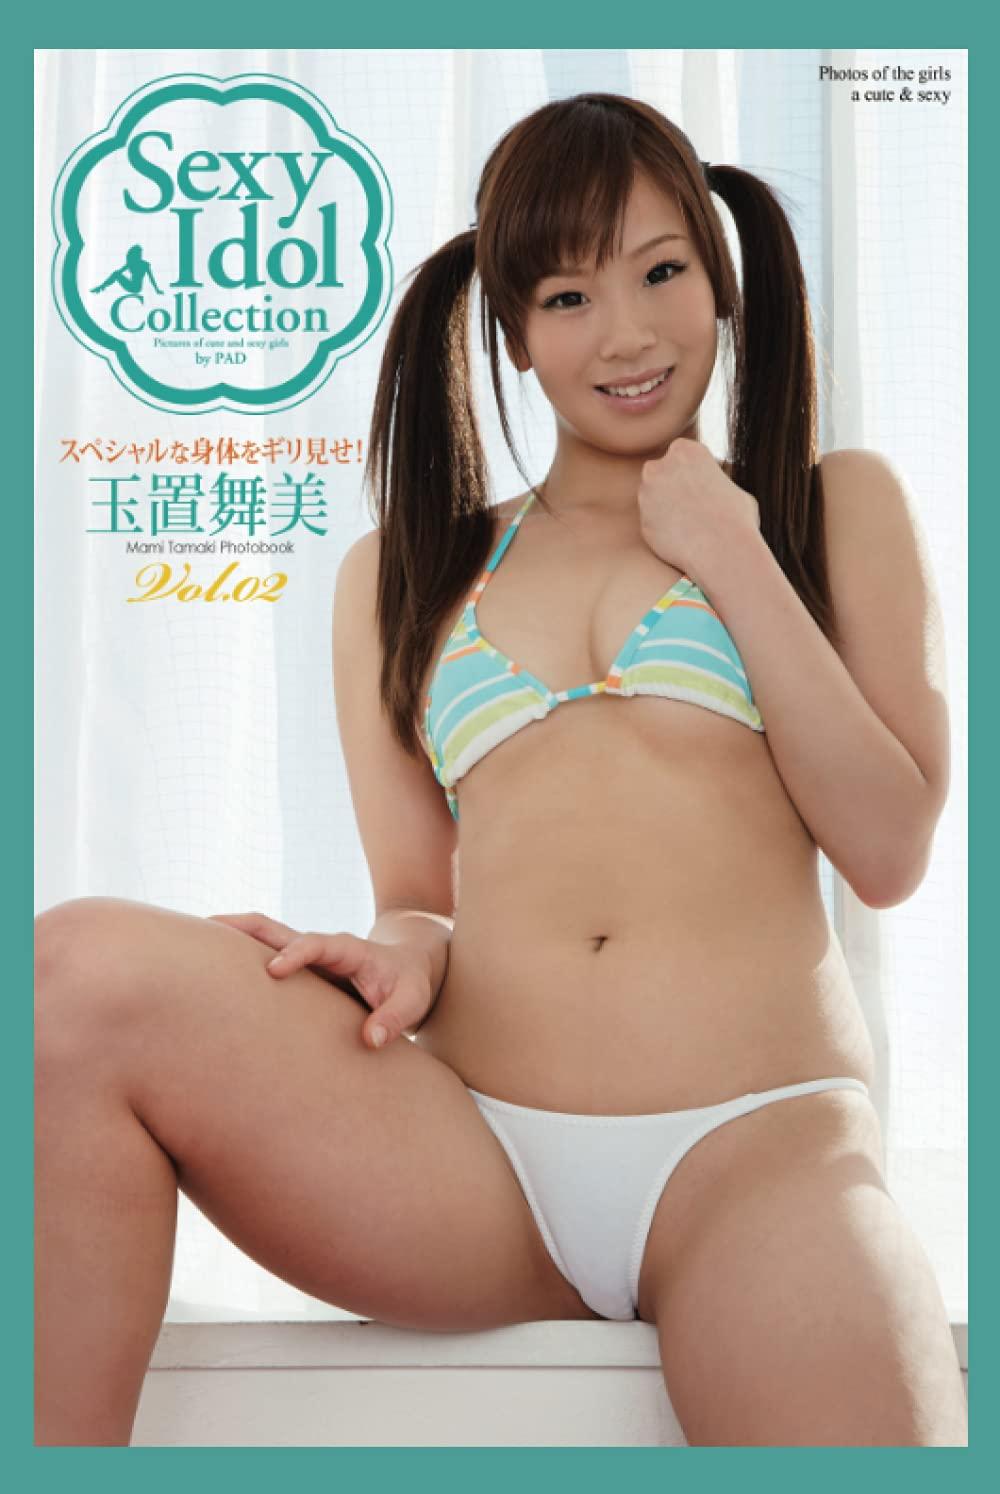 Sexy ldol Collection 玉置舞美 写真集 Vol.02